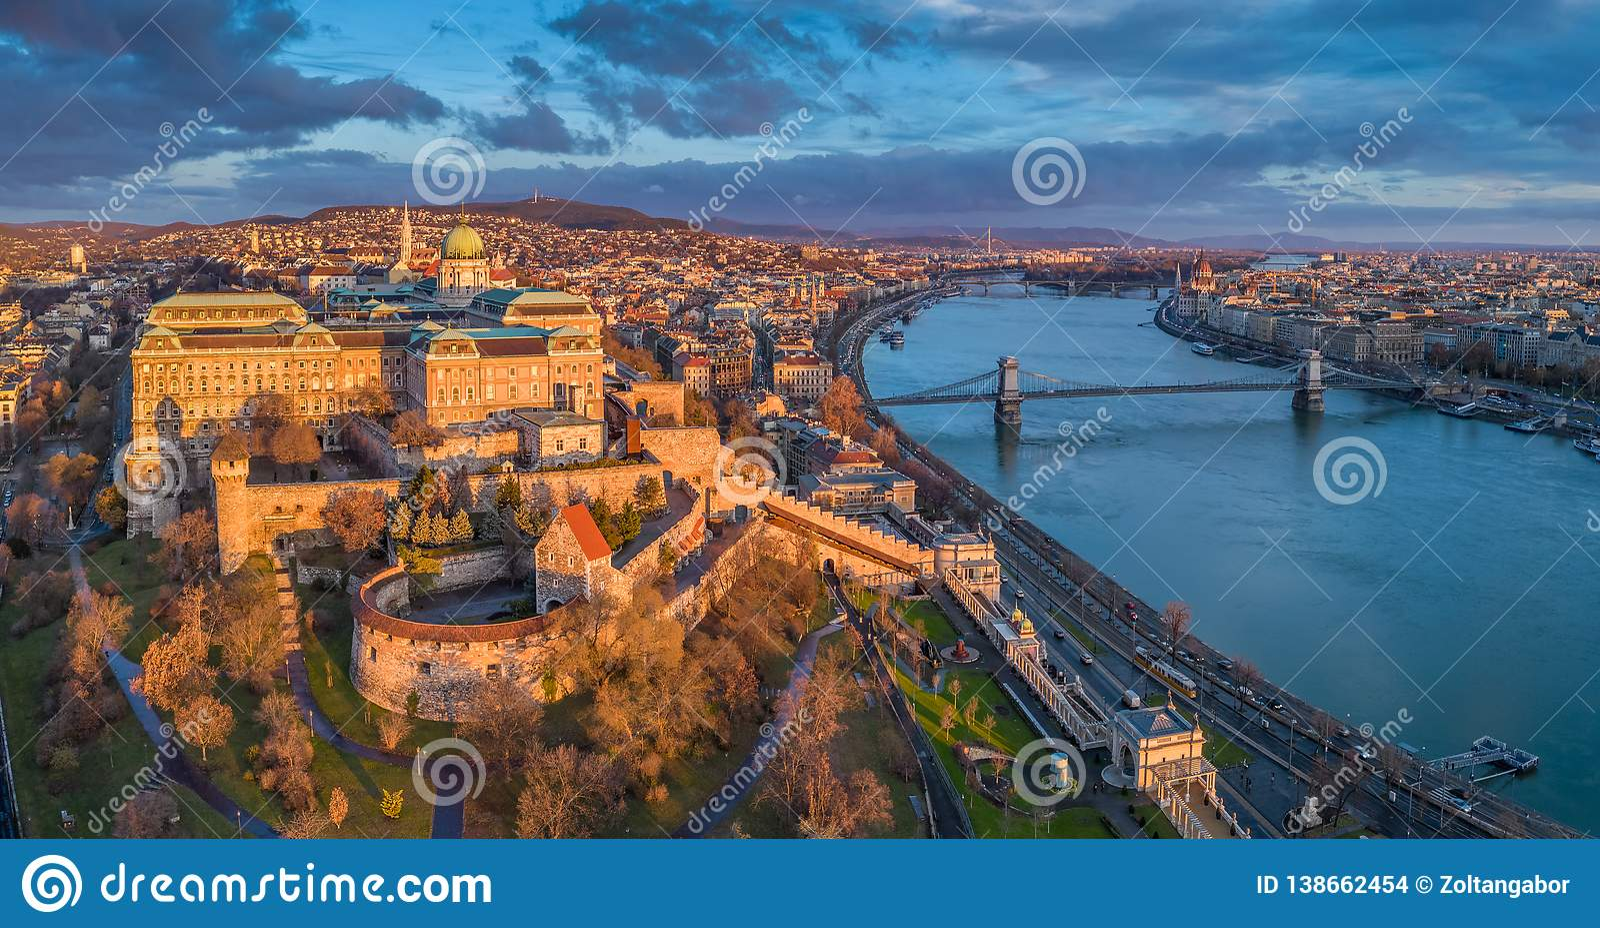 Budapest, Ungarn - Luftpanoramablick von Buda Castle Royal Palace mit Szechenyi-Hängebrücke, Parlament